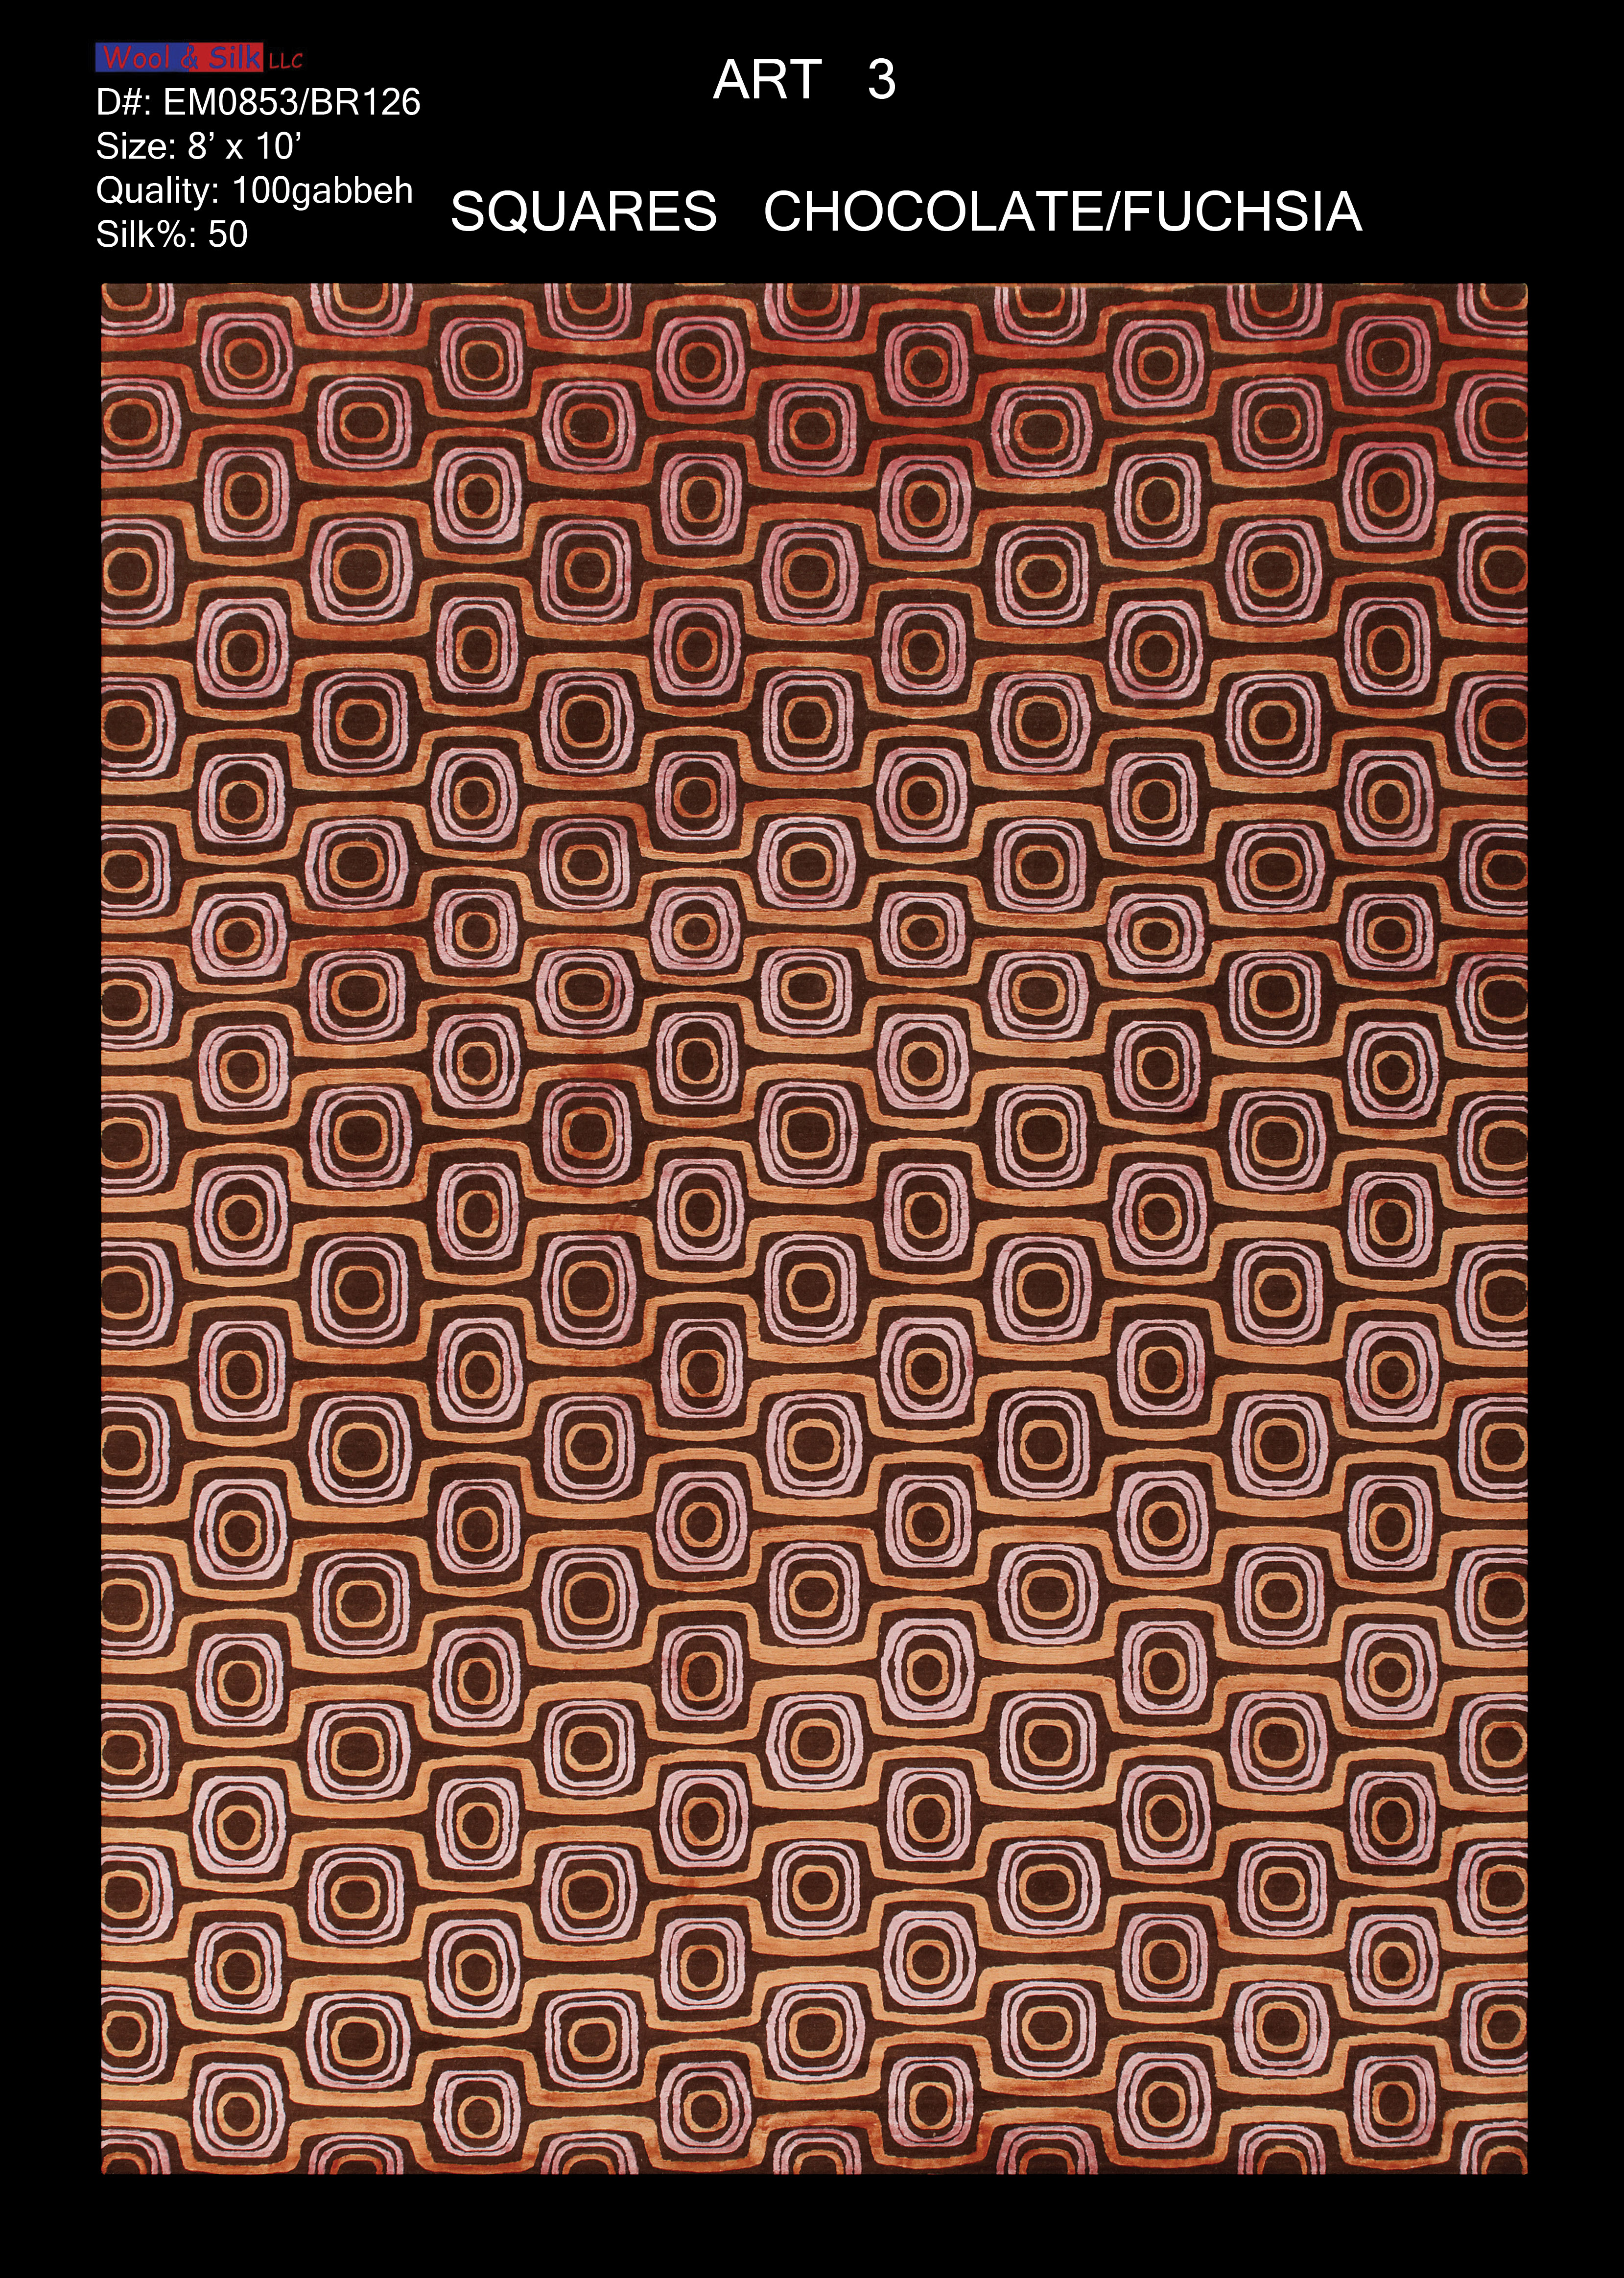 Square-Choc.-Fuchsia(EM0853-BR126) 8'x10'